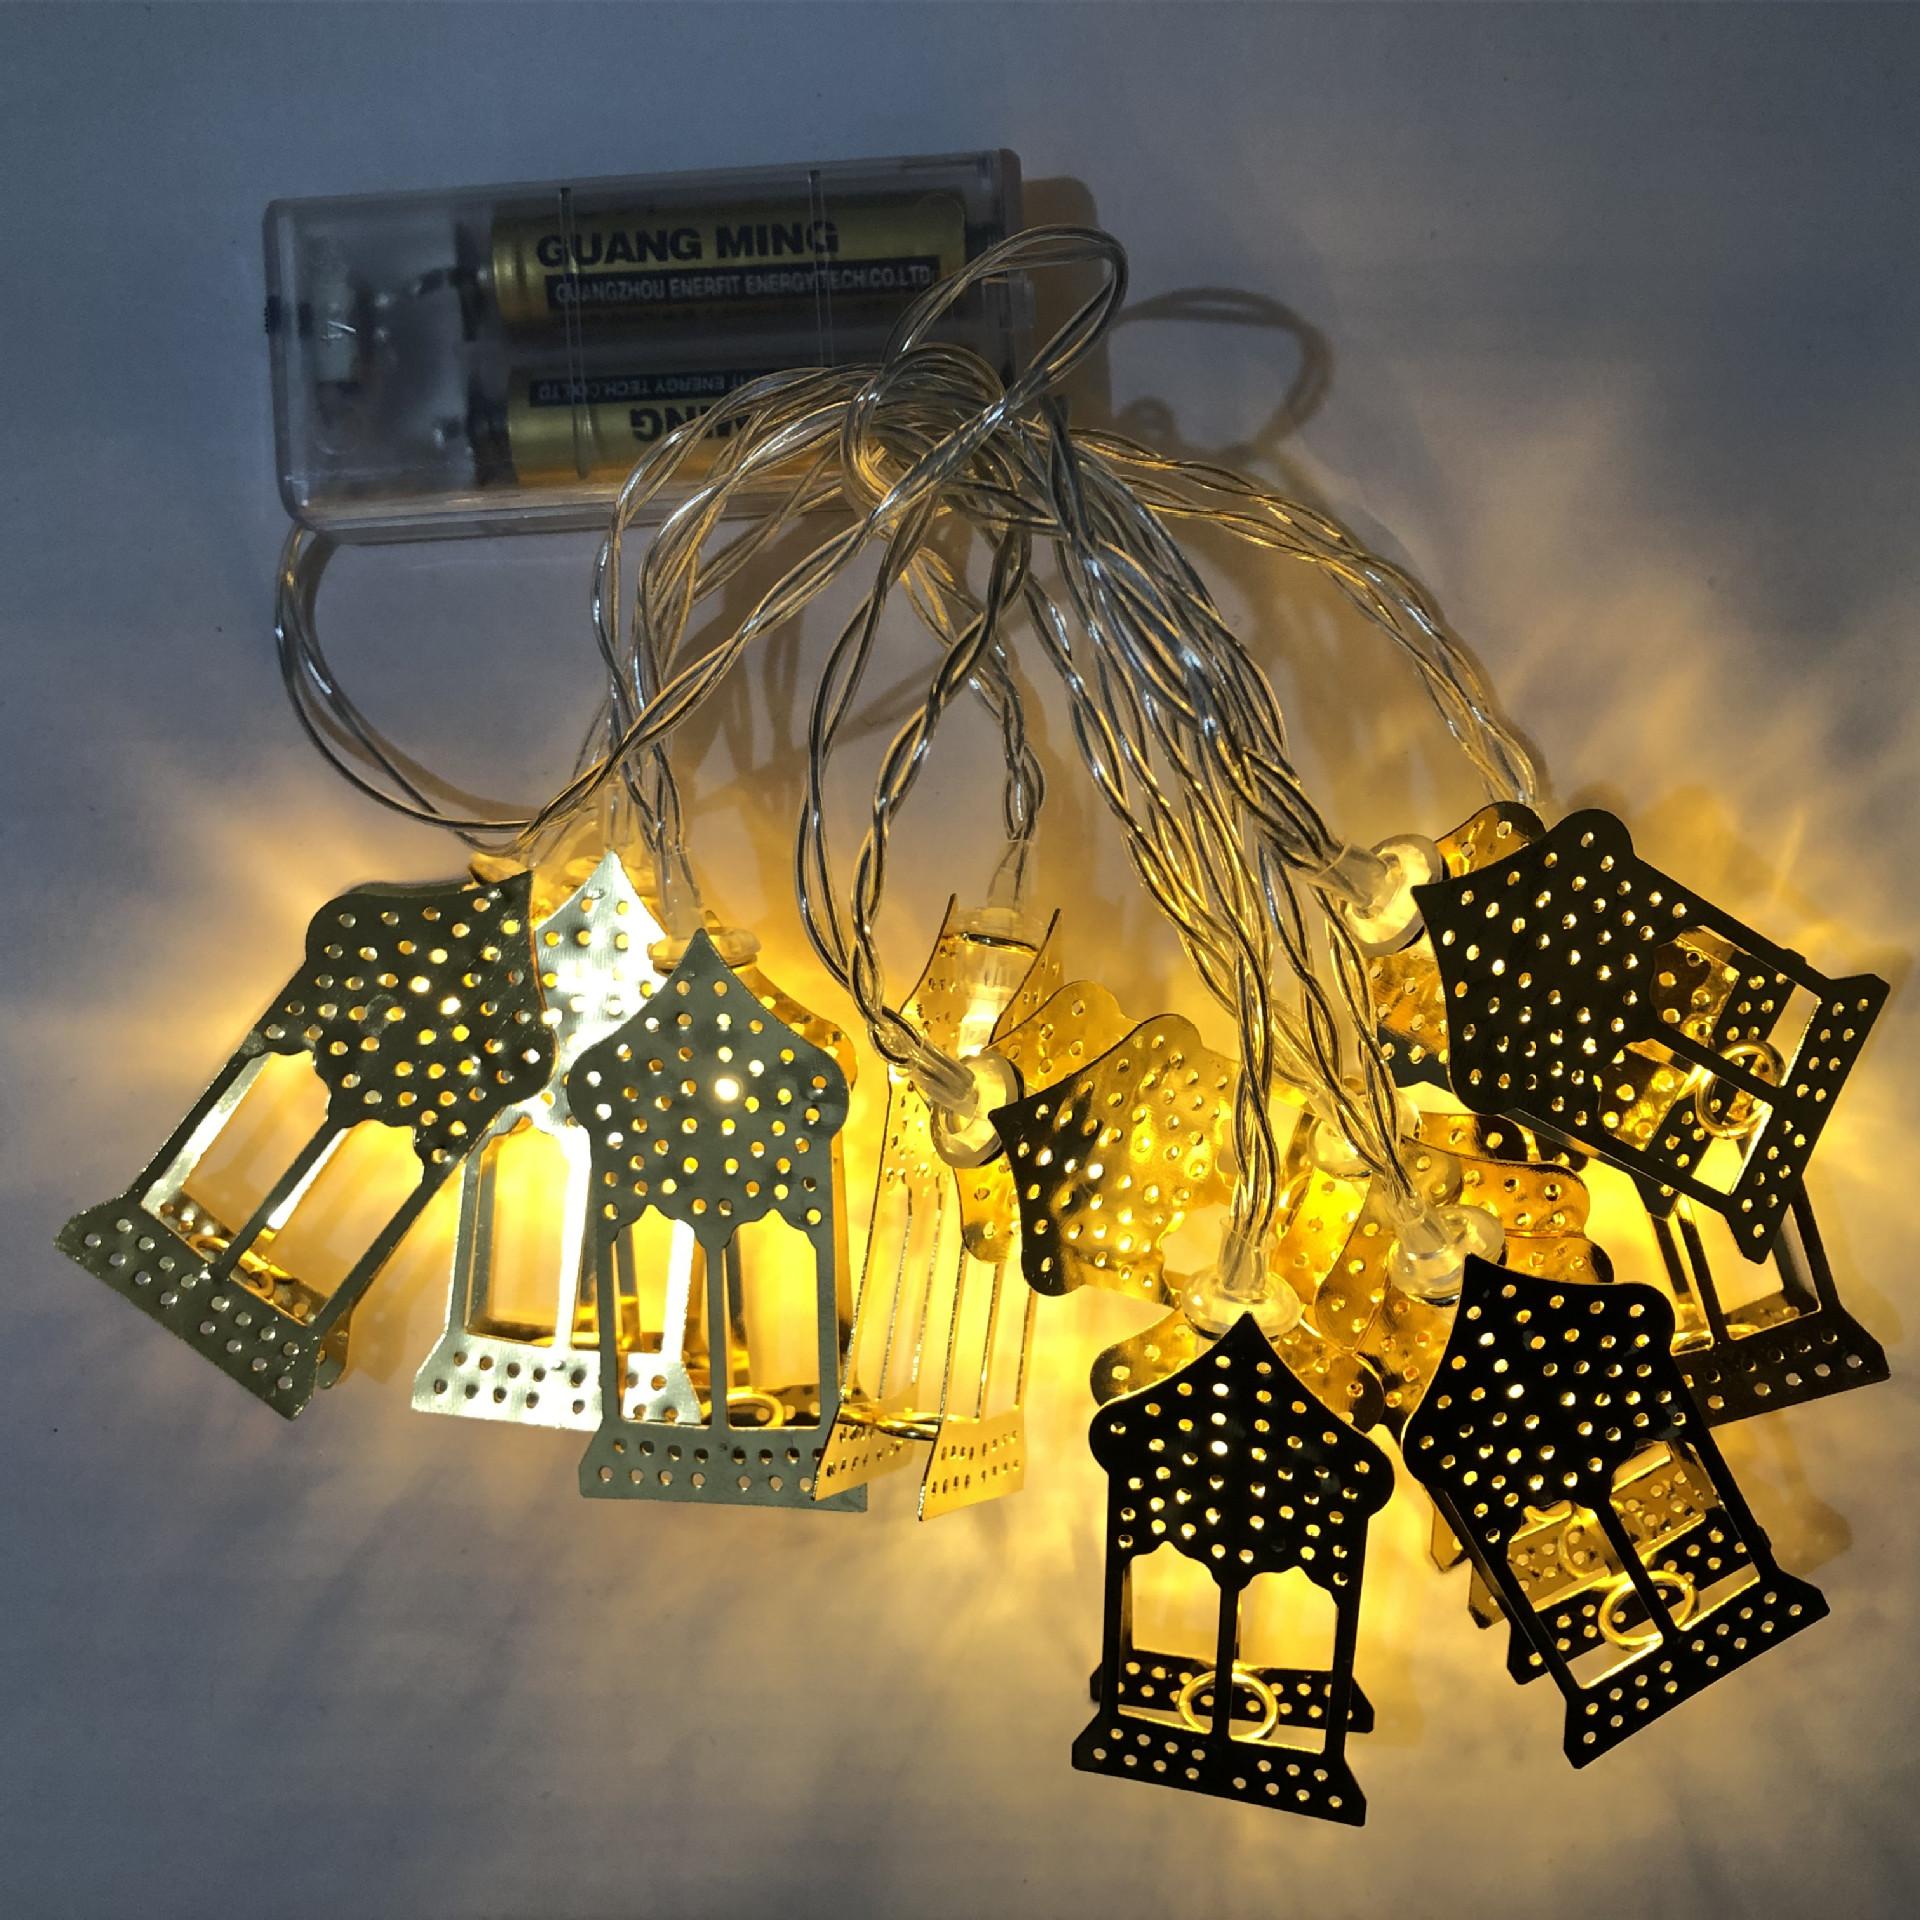 LED String Light Iron House Shape Pendant Garden Xmas Wedding Party Ramadan Eid Decor Warm White